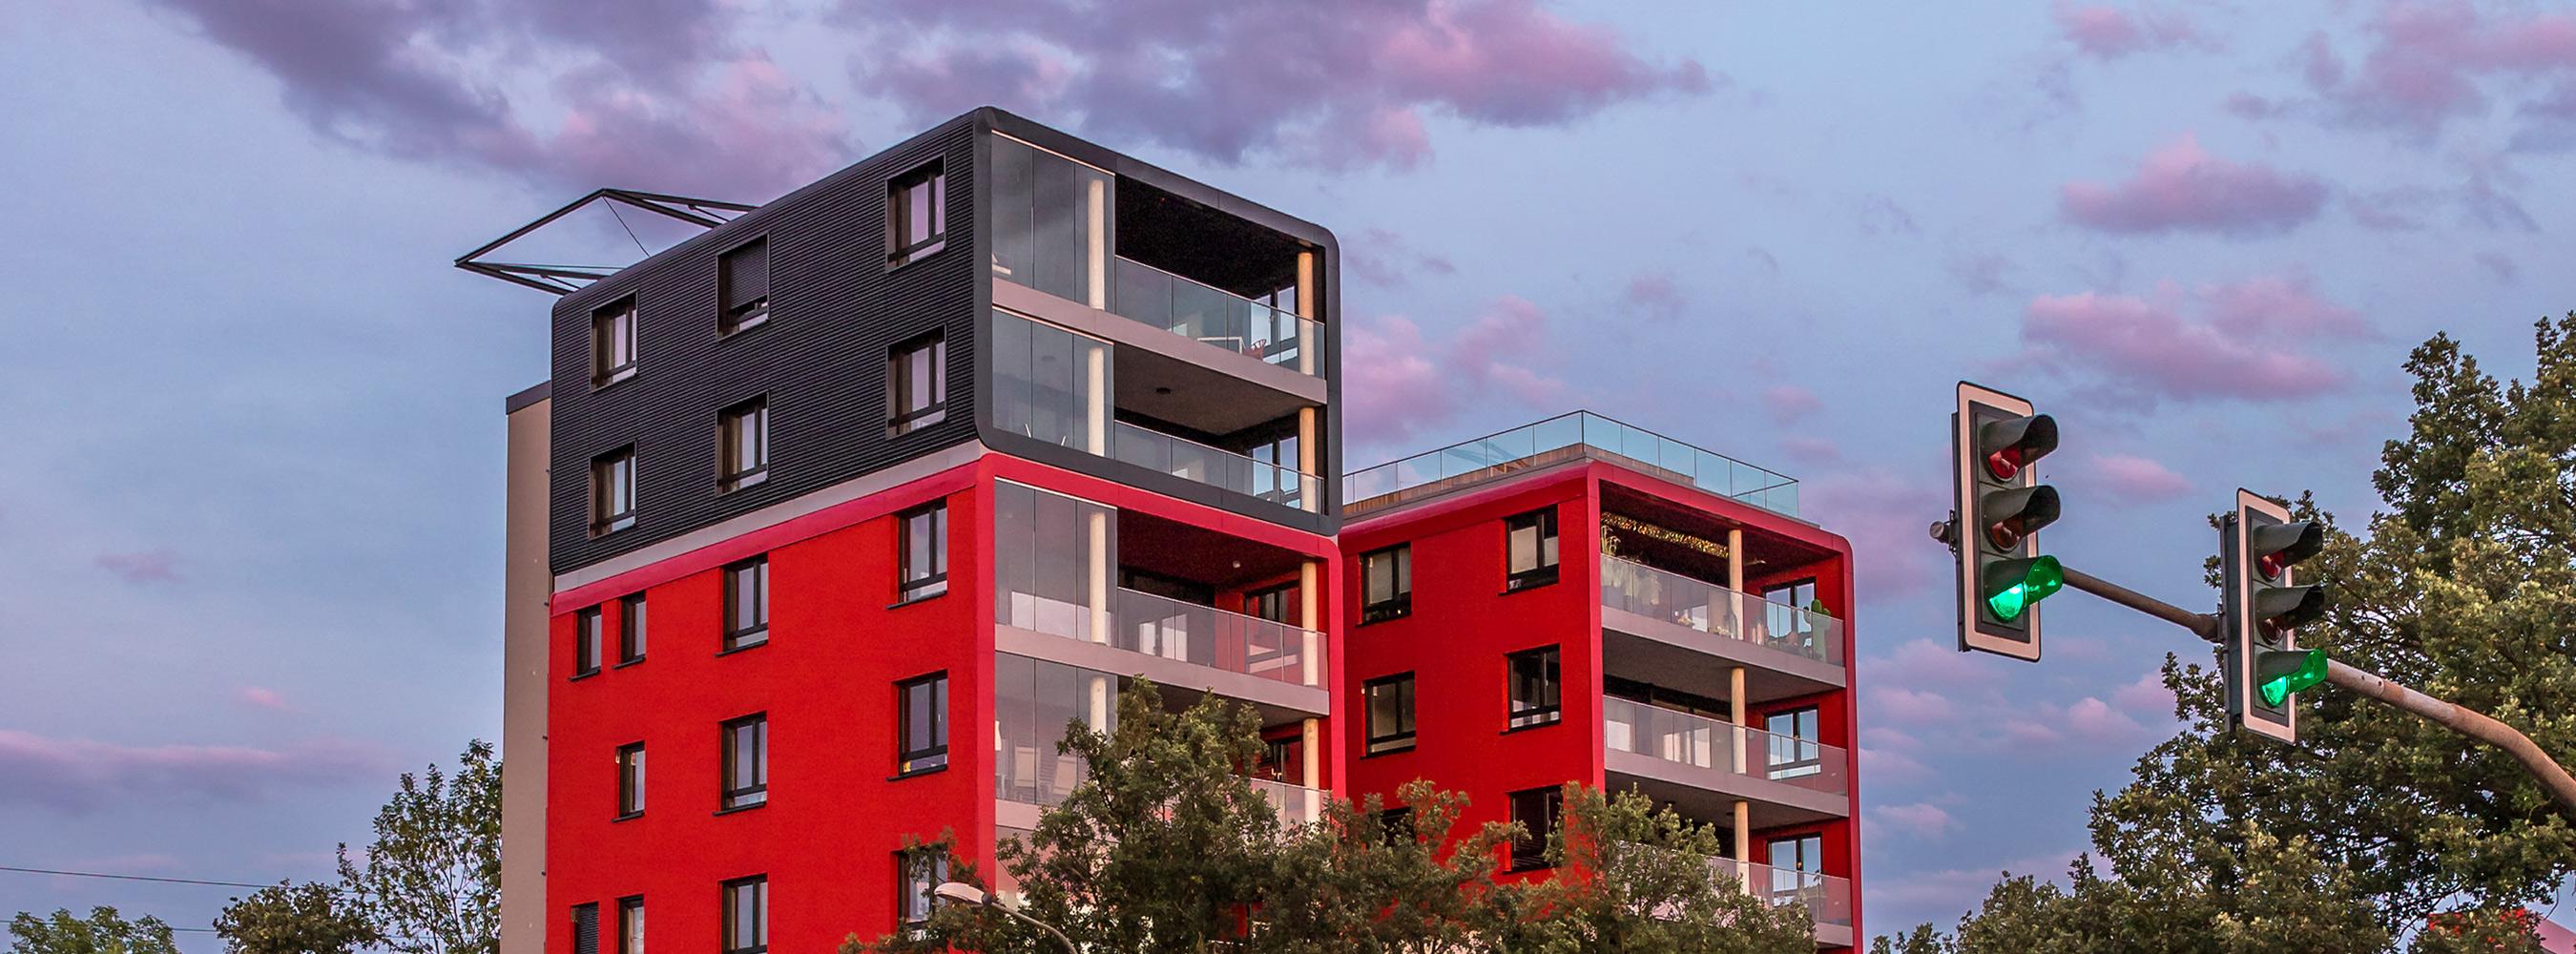 Architekturfotografie | Immobilienfotografie